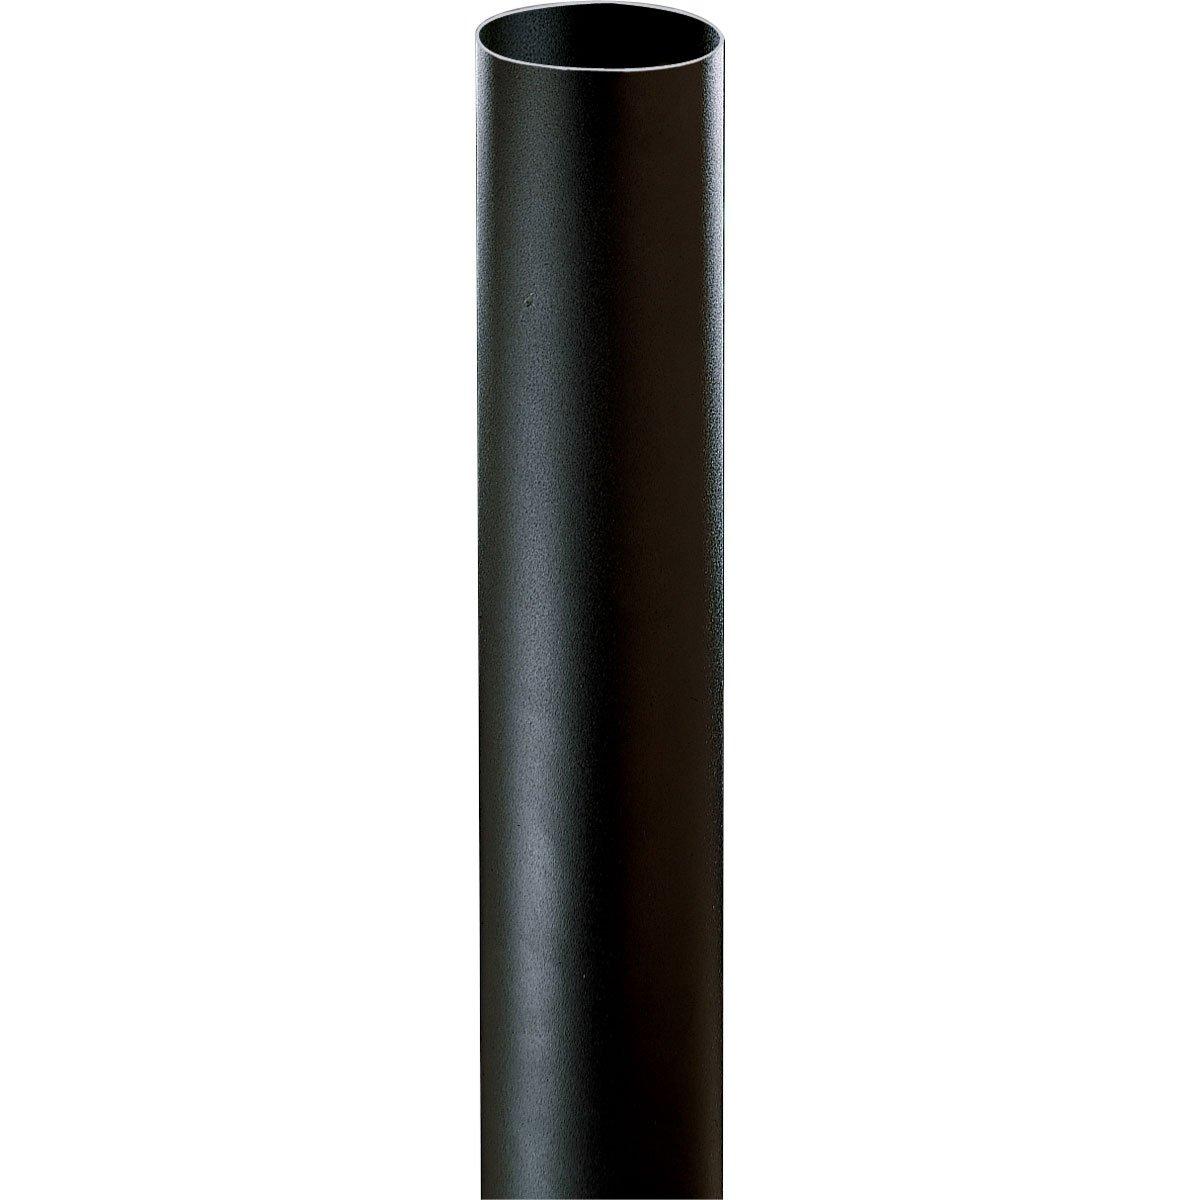 Progress Lighting P5313-31 Black Bollard Shown with P5205-31 Light (Order Separately), Black